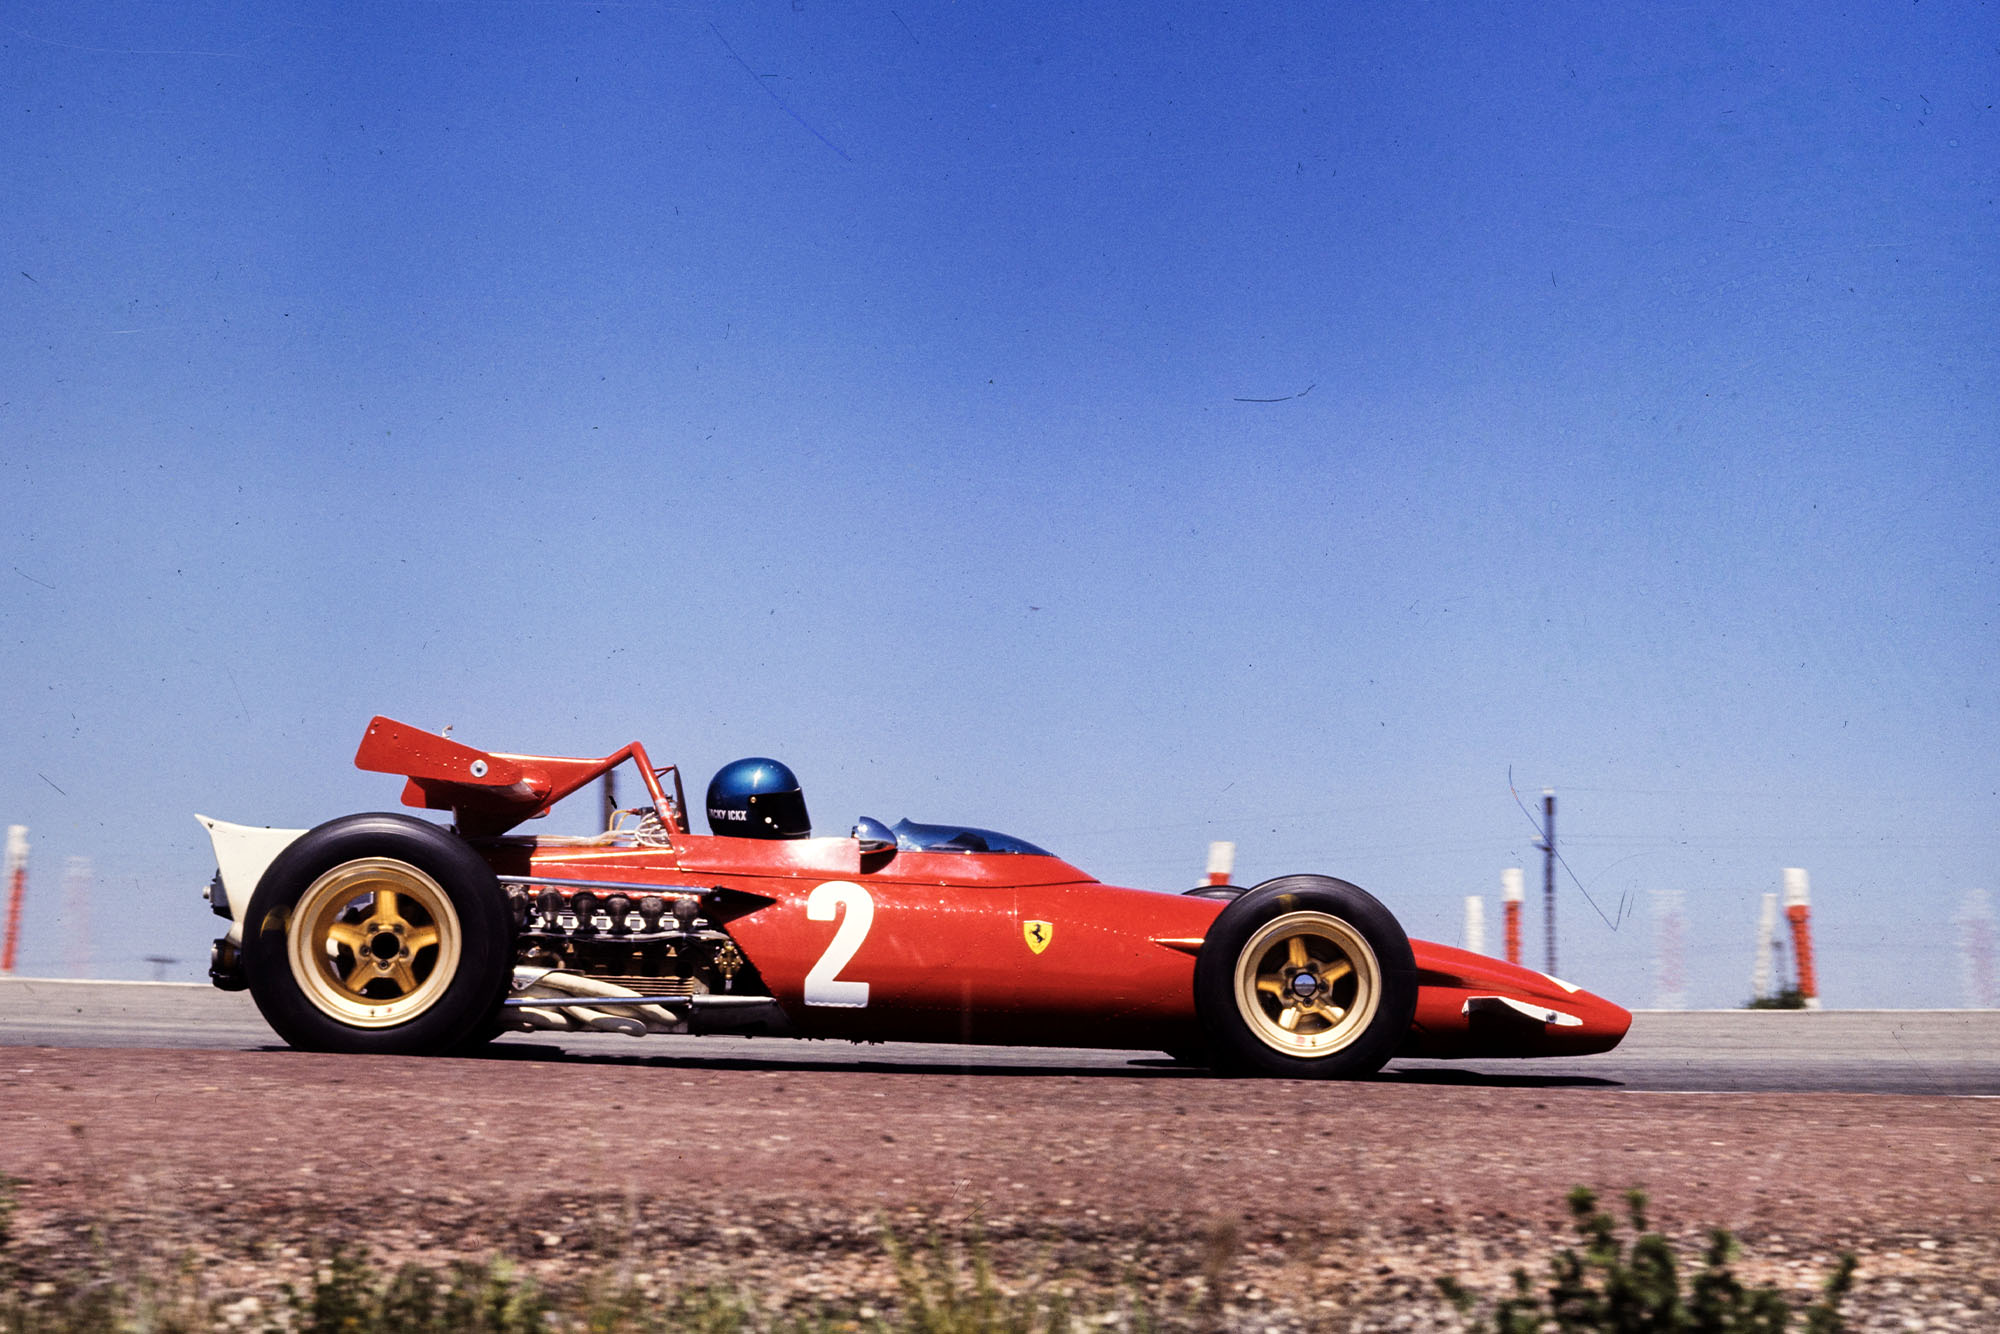 Jacky Ickx in his Ferrari at the 1970 Spanish Grand Prix